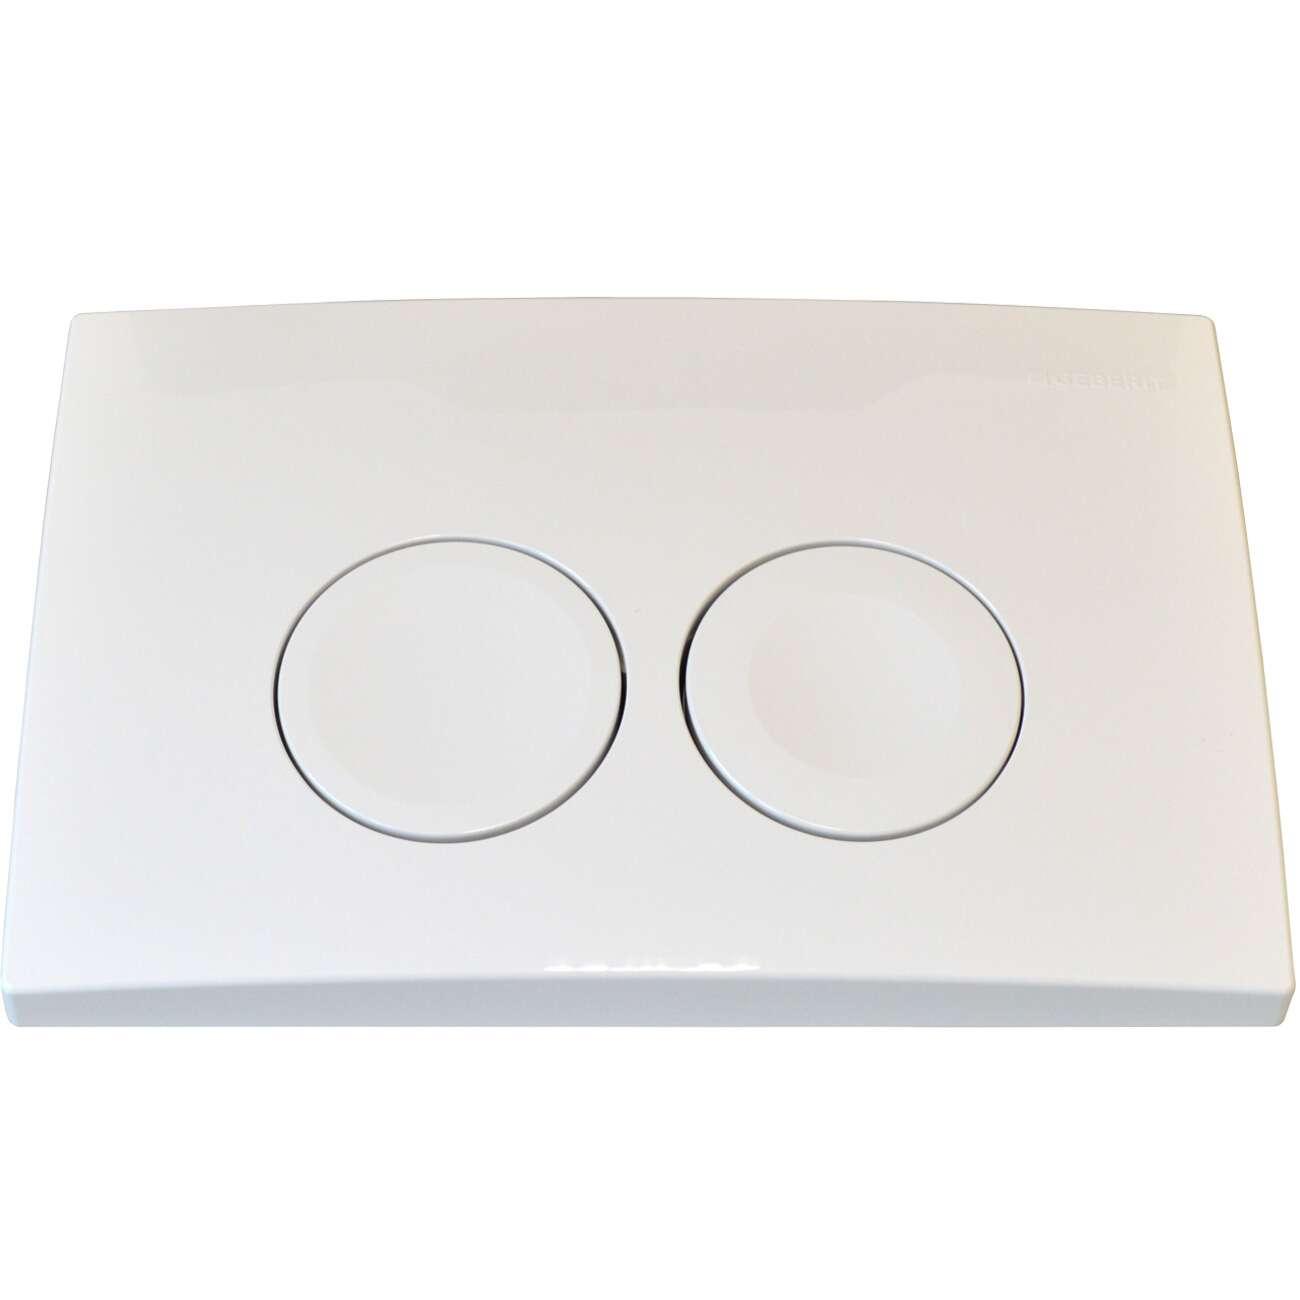 geberit abdeckplatte delta 21 wei f r duofix basic up 100 1762516. Black Bedroom Furniture Sets. Home Design Ideas